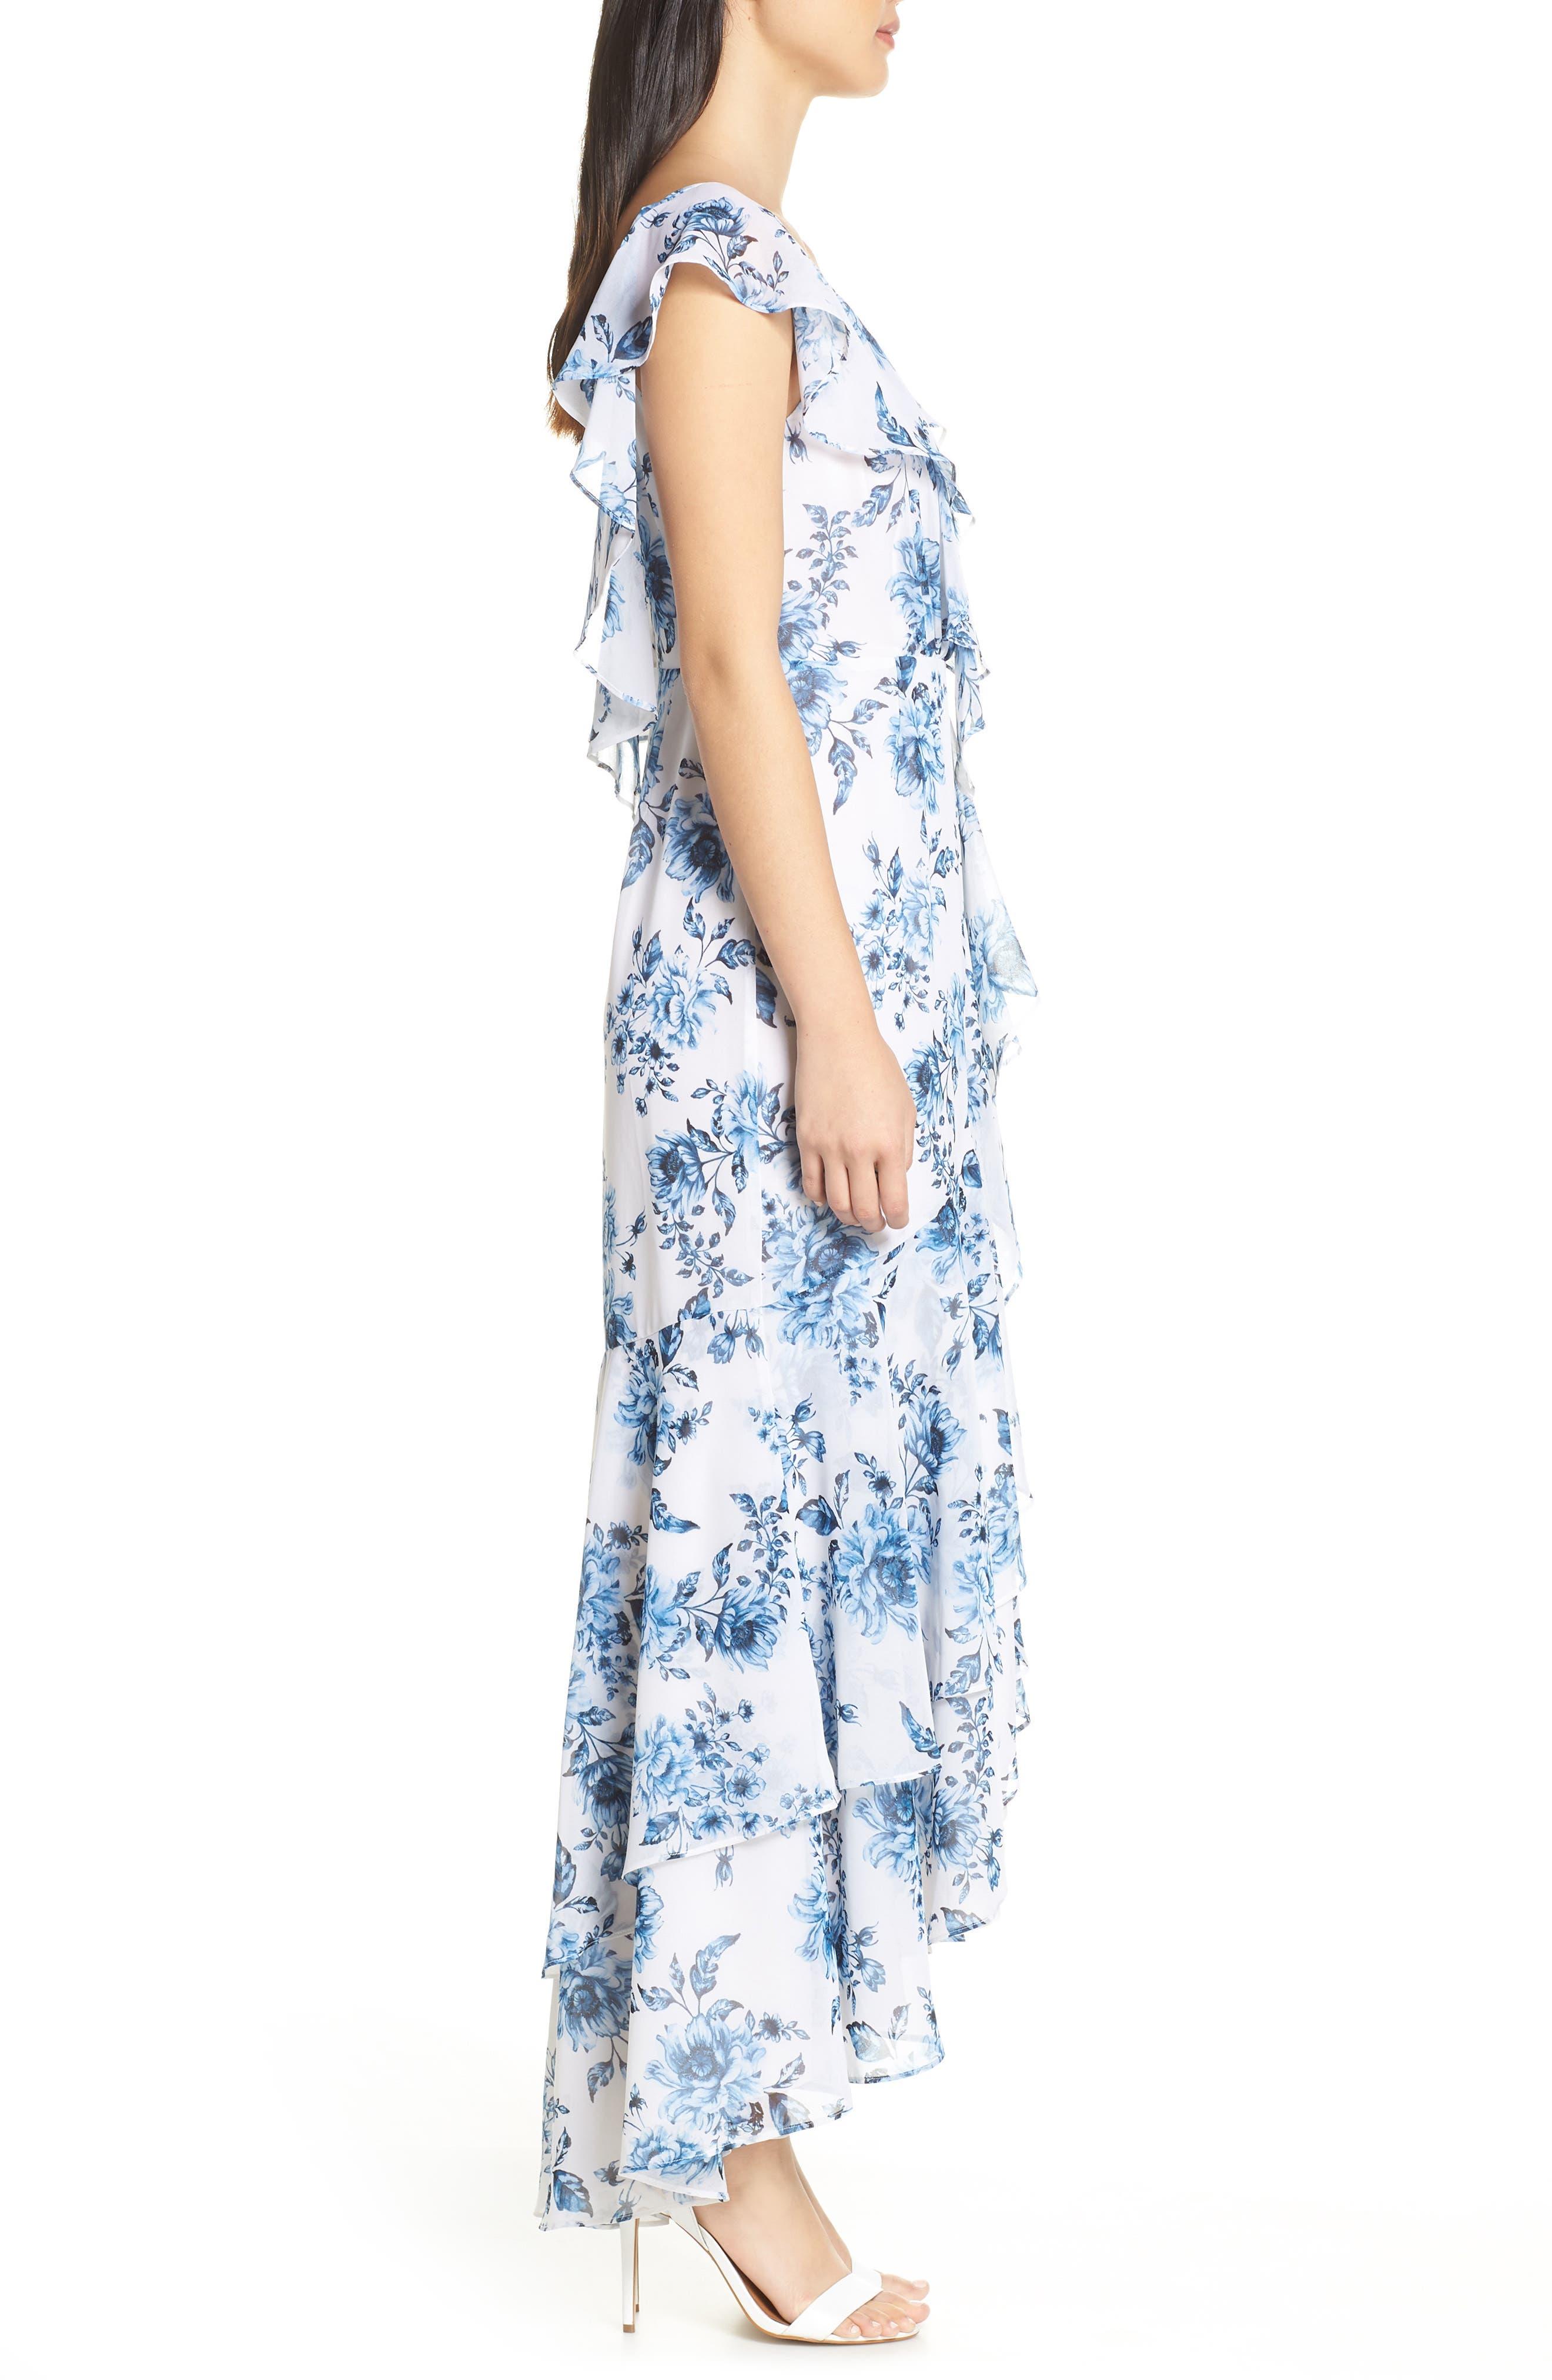 Elanor Ruffle Faux Wrap Maxi Dress,                             Alternate thumbnail 3, color,                             BLUE TOILE FLORAL